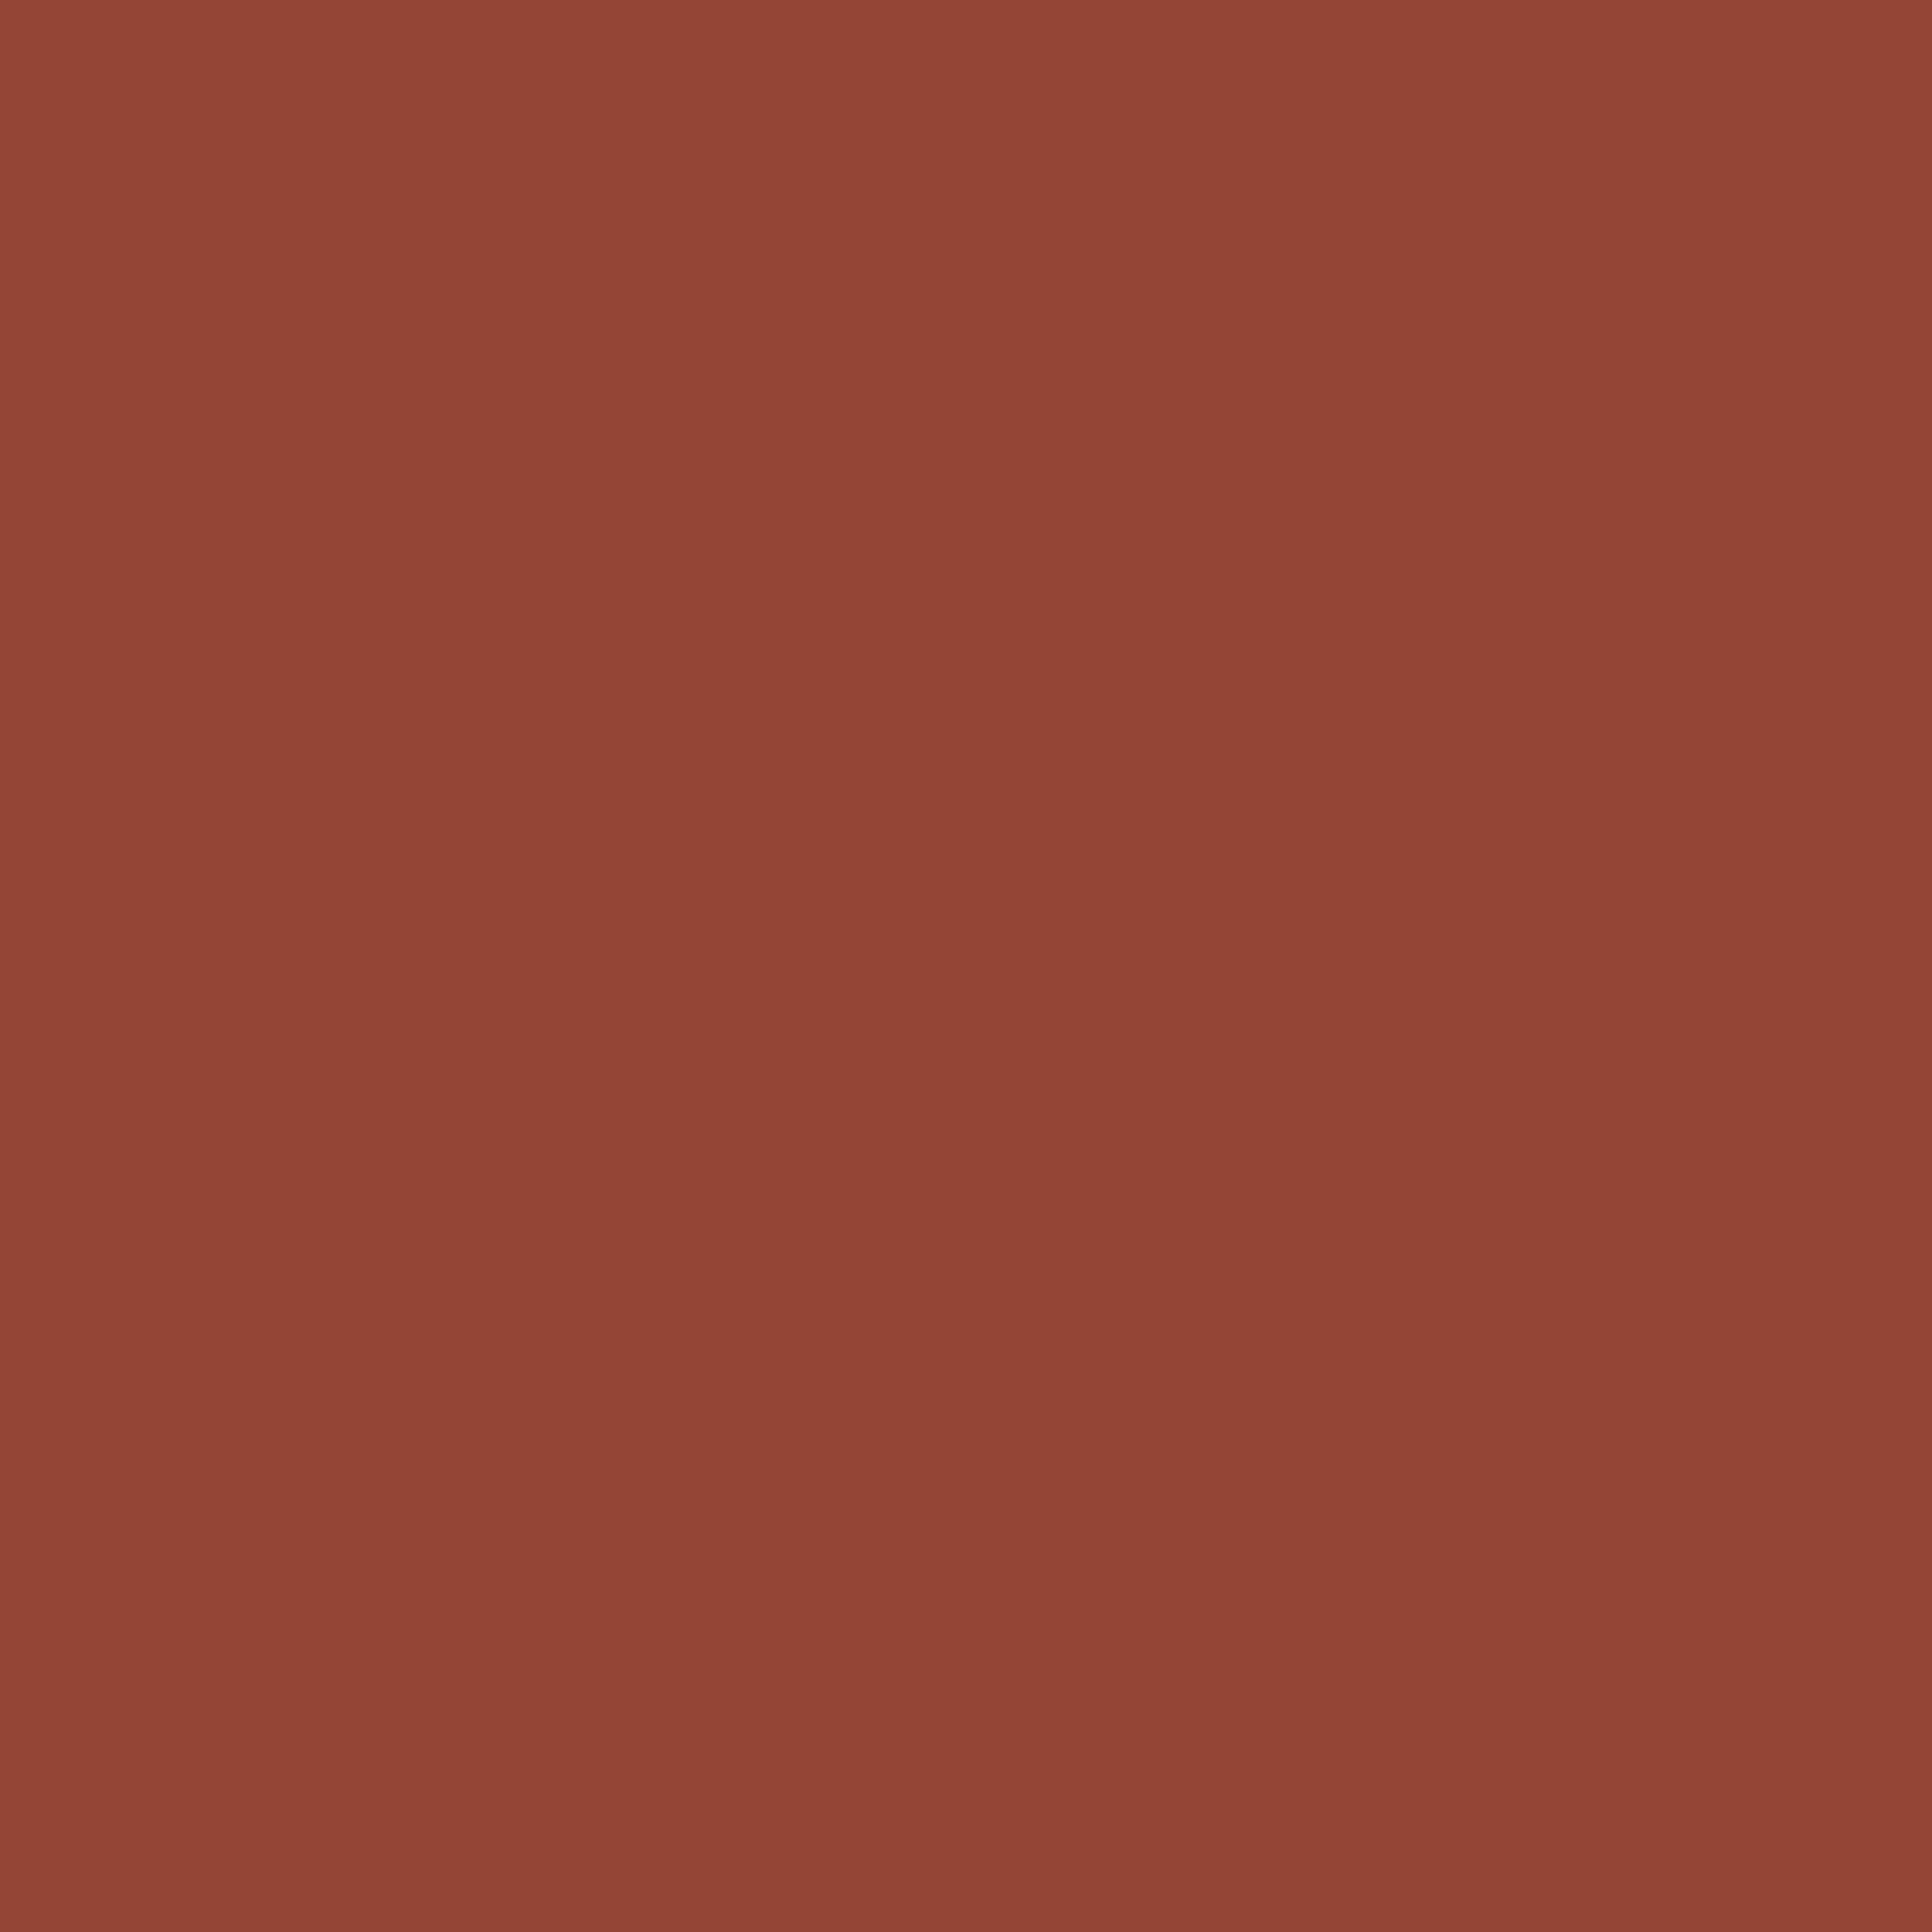 3600x3600 Chestnut Solid Color Background